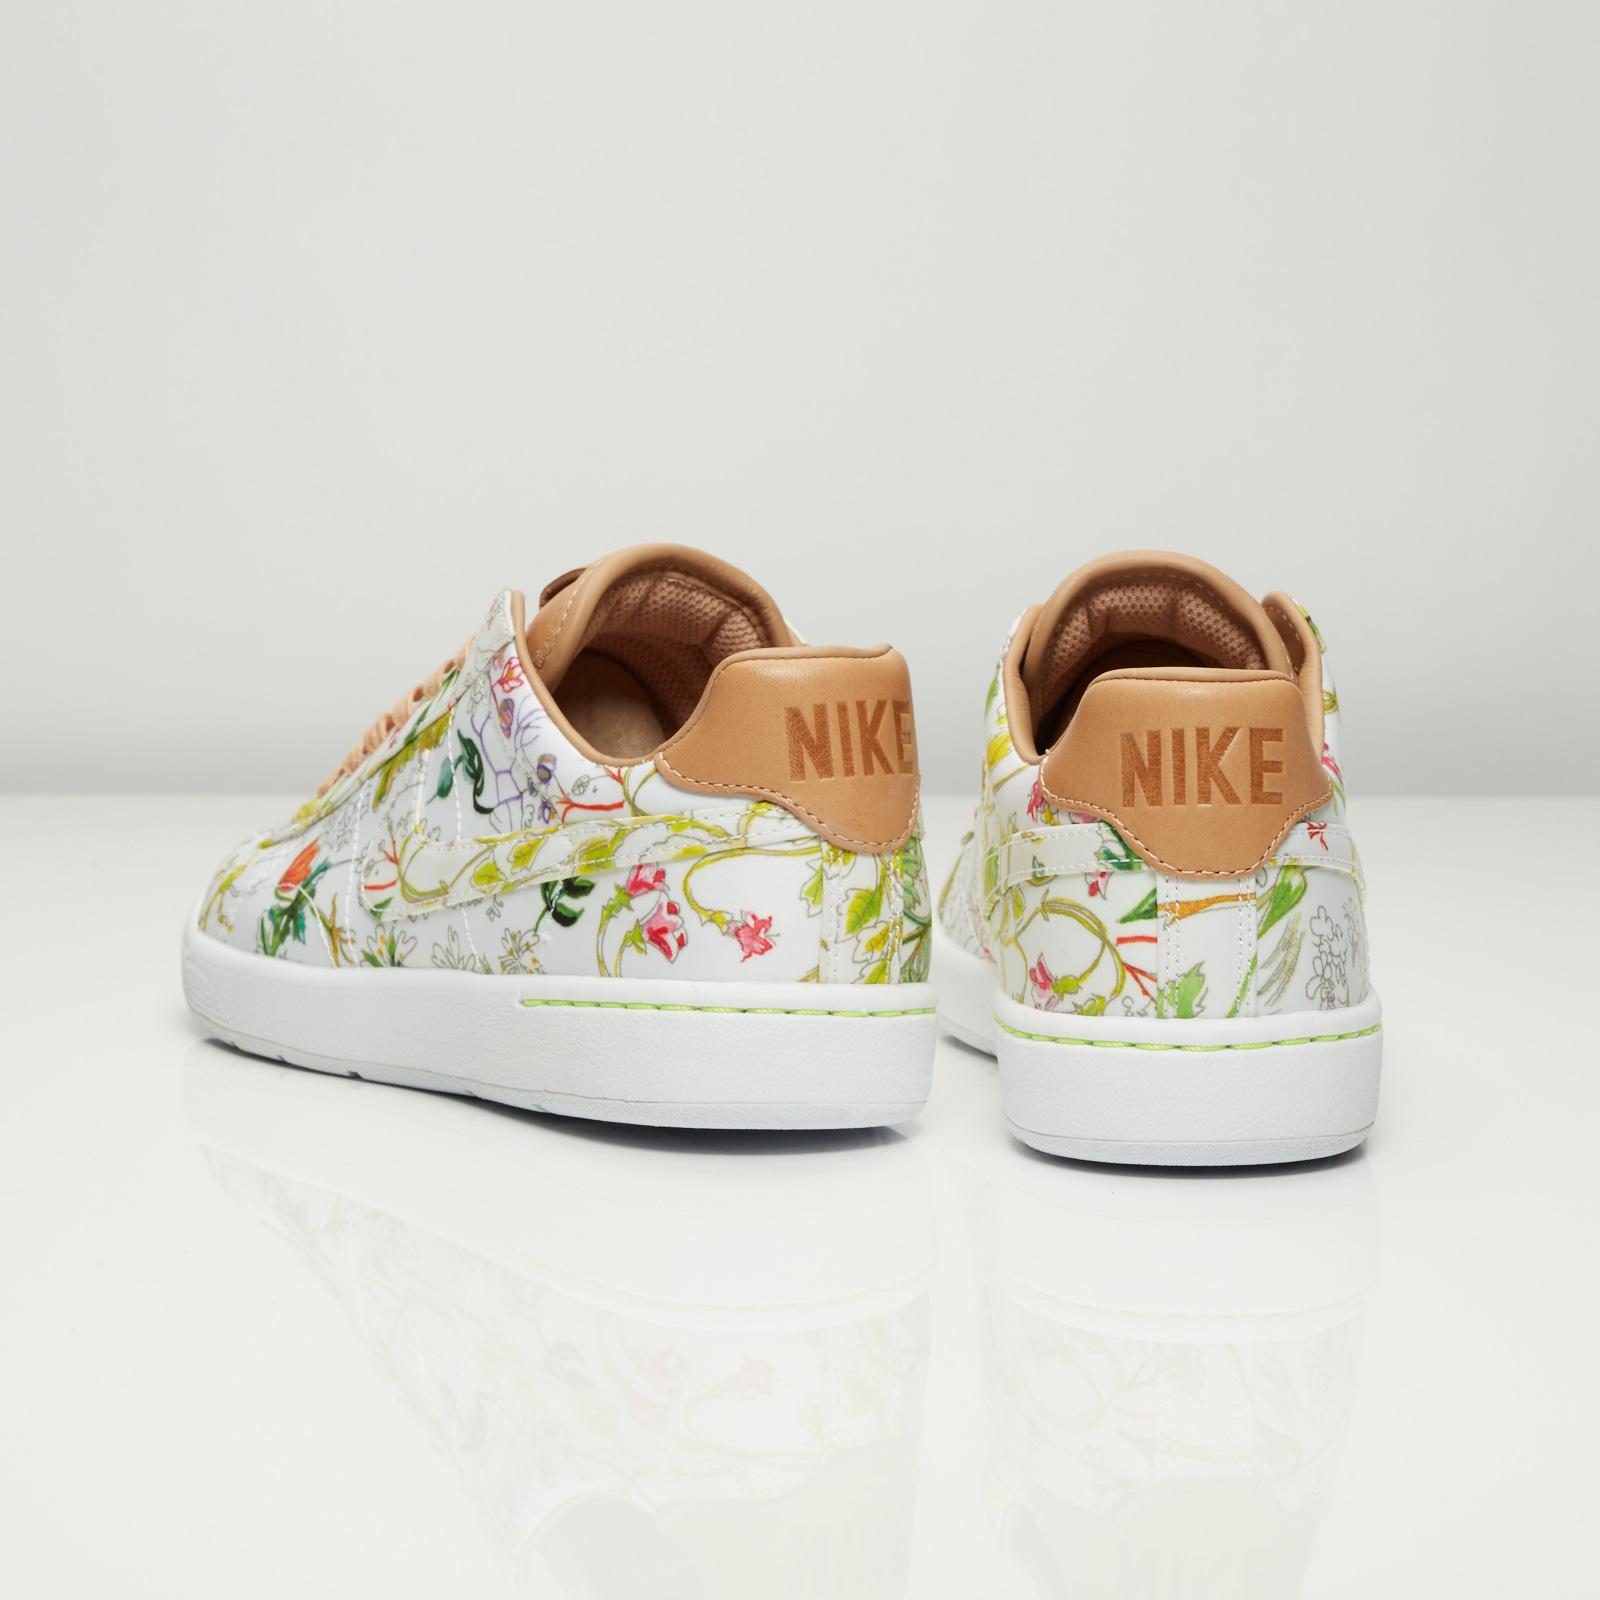 best sneakers 7249e c498d ... Nike W Tennis Classic Ultra LIB QS ...